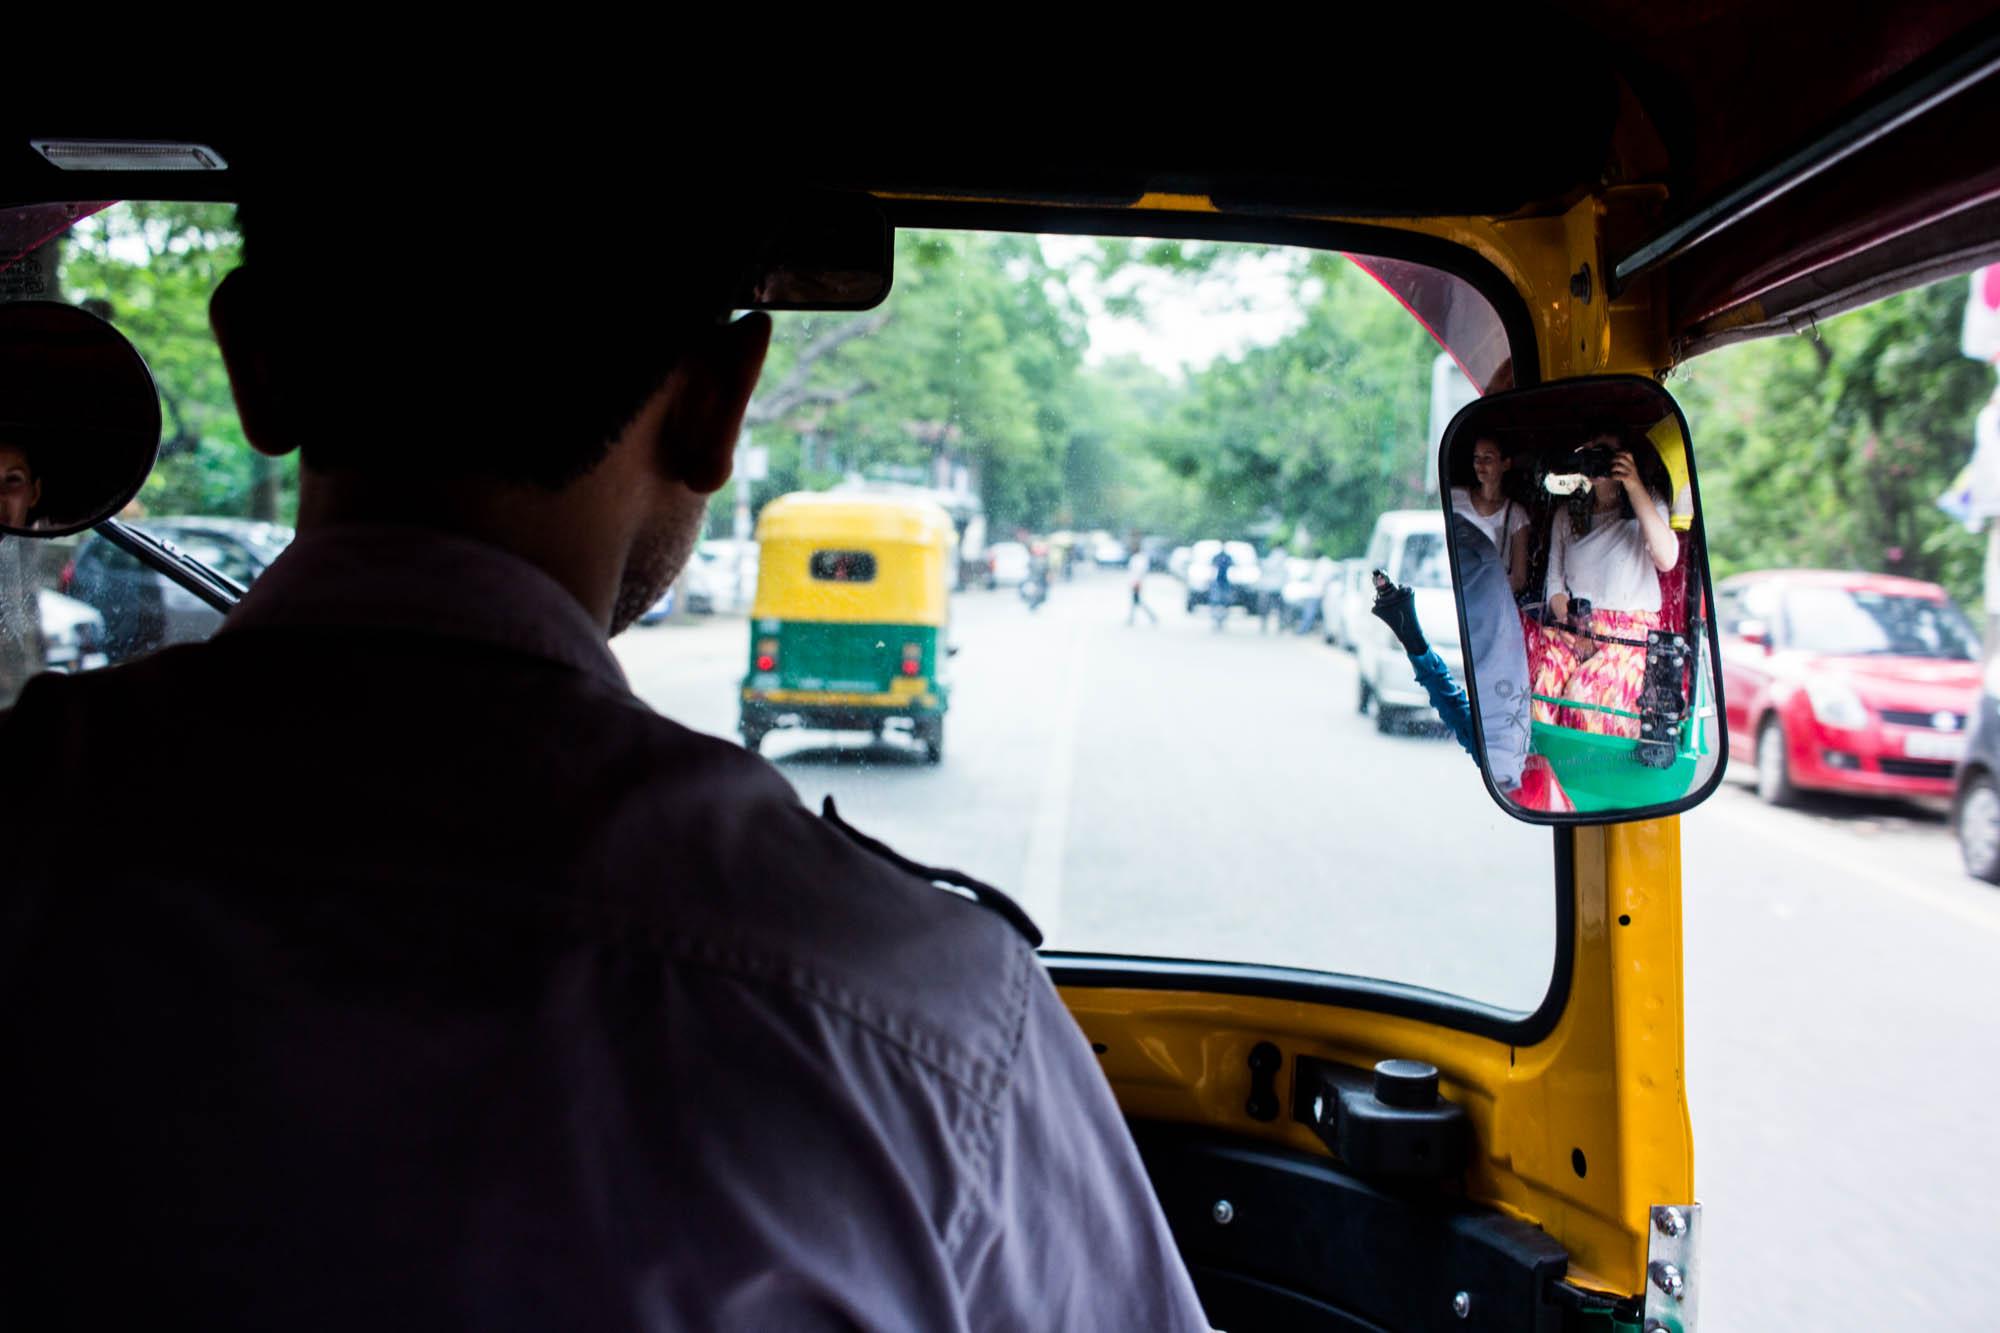 golden triangle rajasthan taj mahal jaipur delhi india tips must see kathi kamleitner travelettes-53